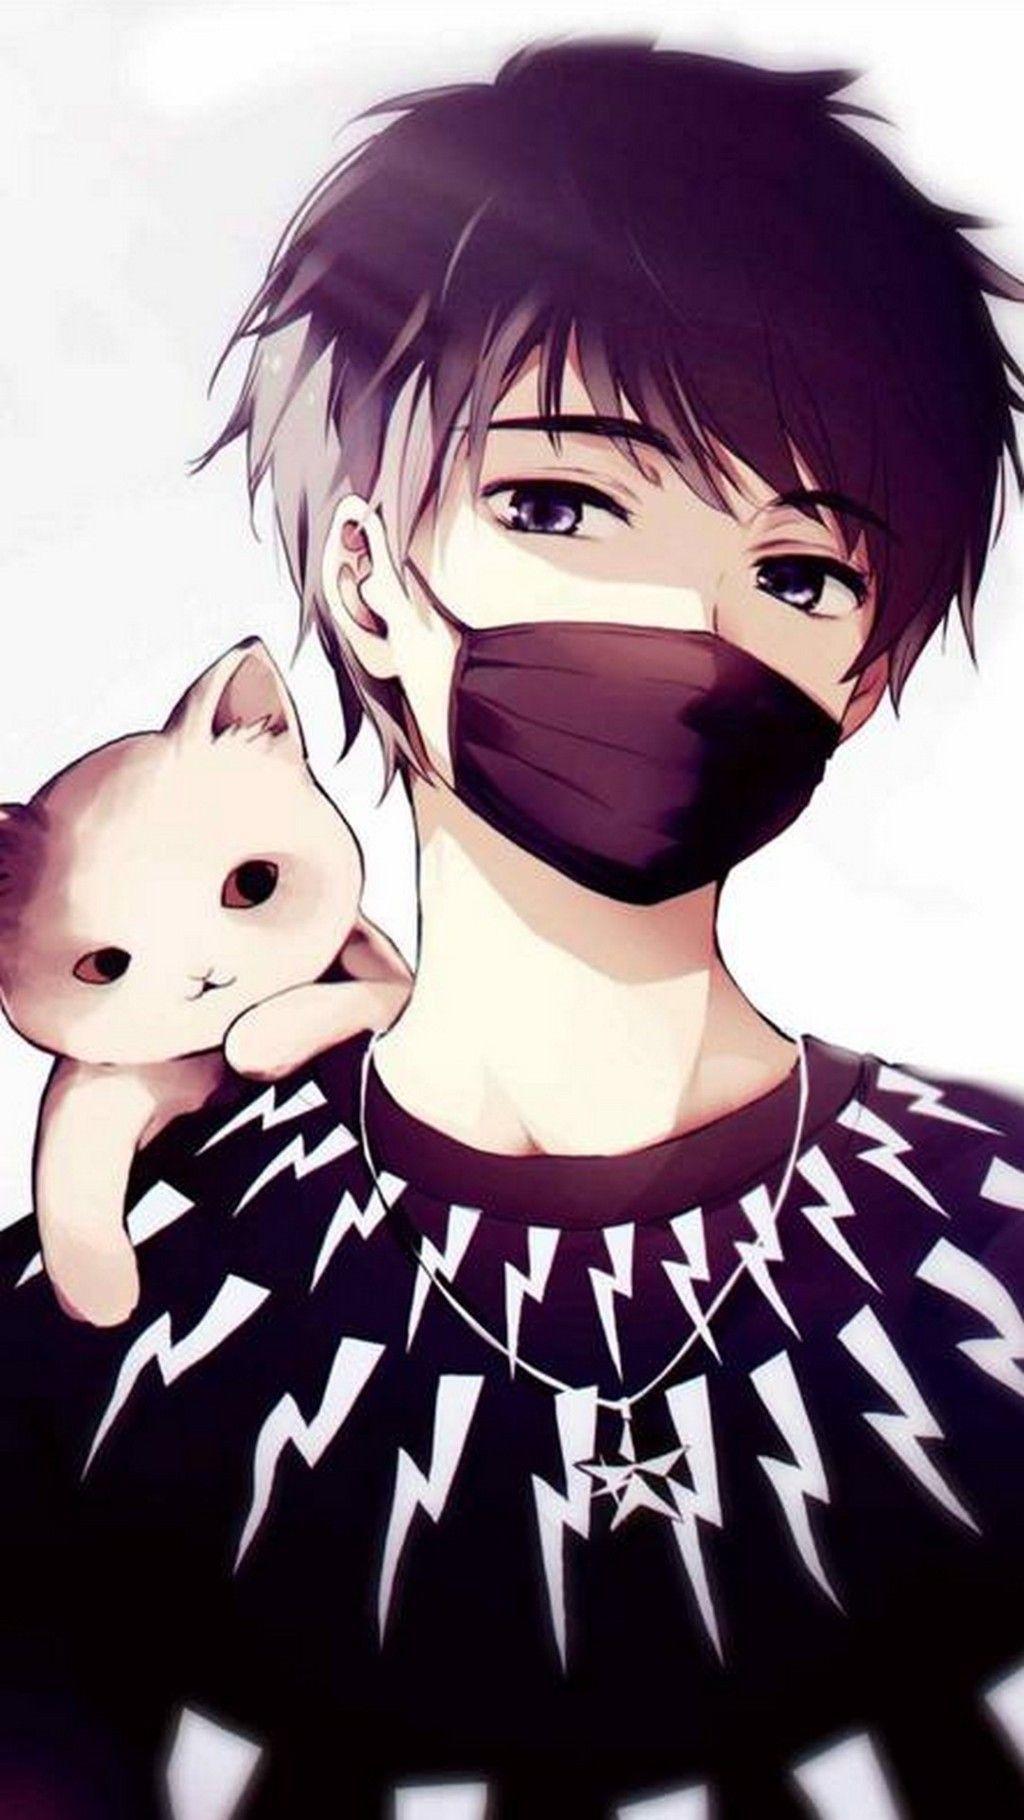 Anime Wallpaper Hd Anime Wallpaper Anime Art Anime Anime simple boy wallpaper